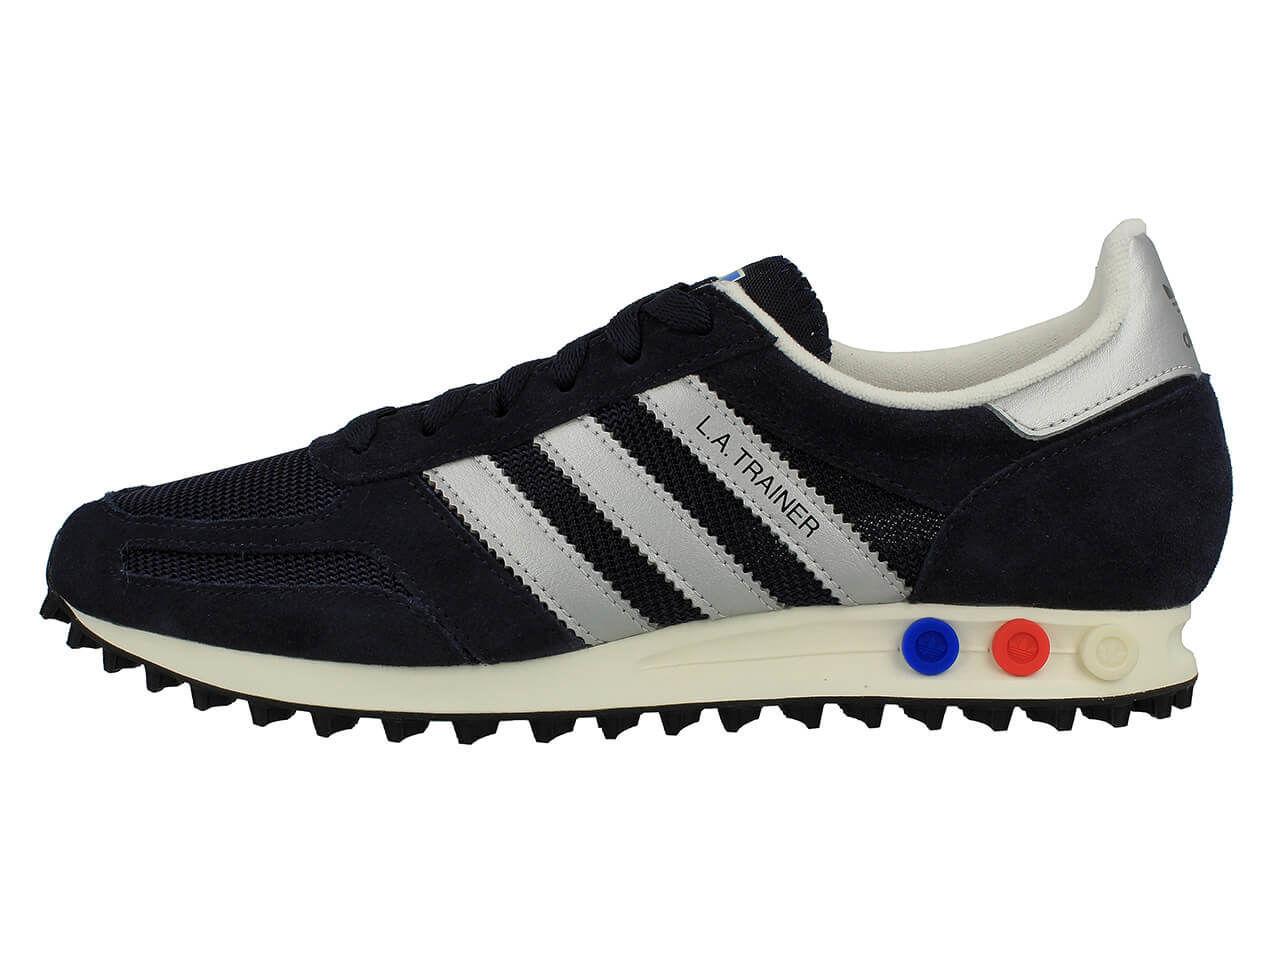 Buty adidas La Trainer OG BY9323 # 44 7092503959